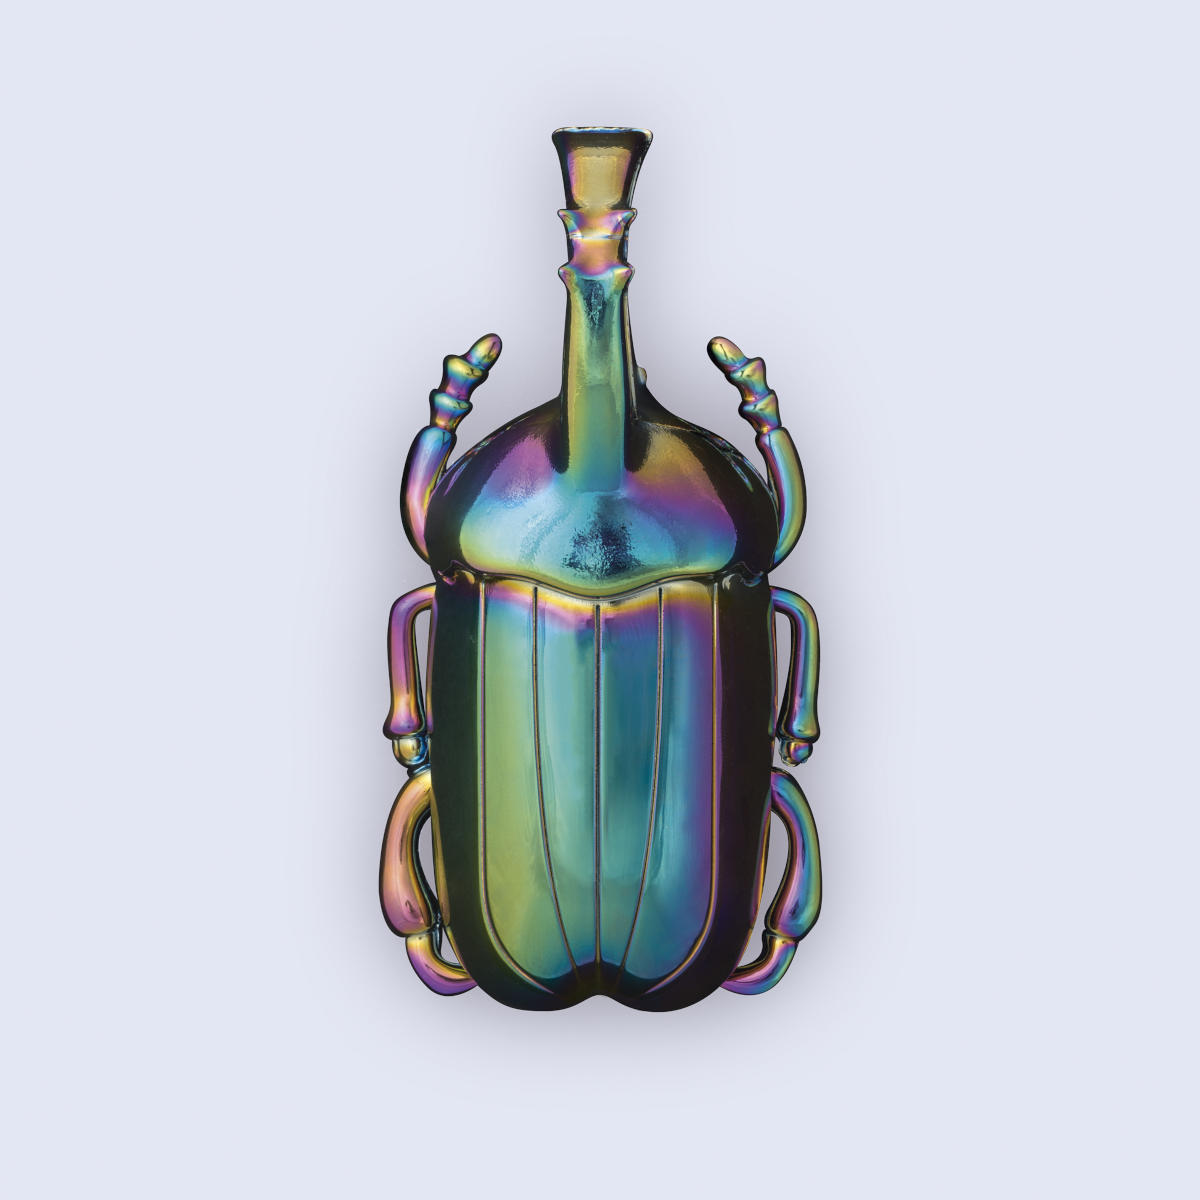 Insectum Kapsylöppnare - Skimrande